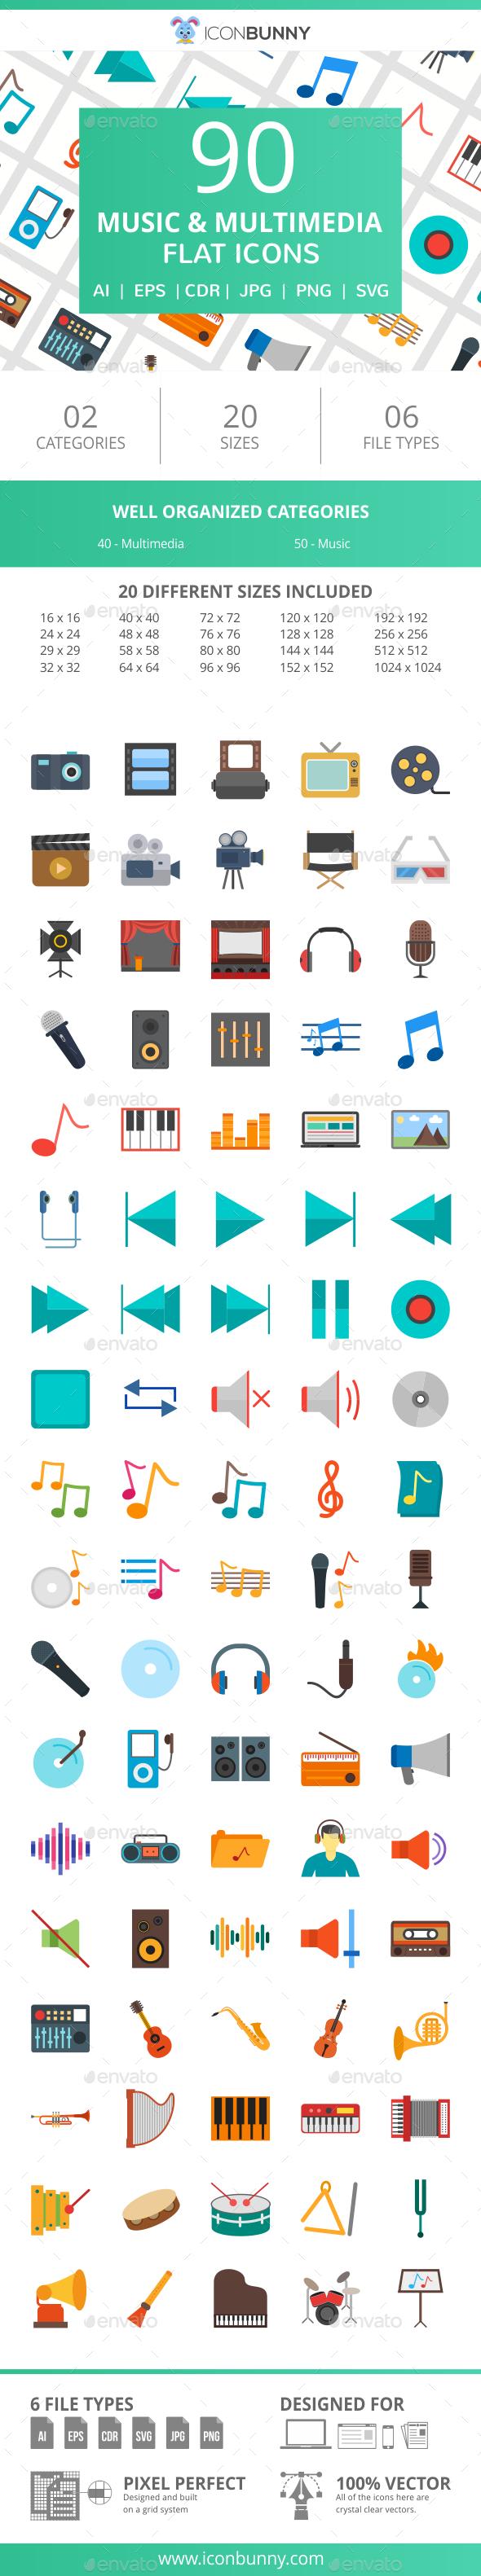 90 Music & Multimedia Flat Icons - Icons